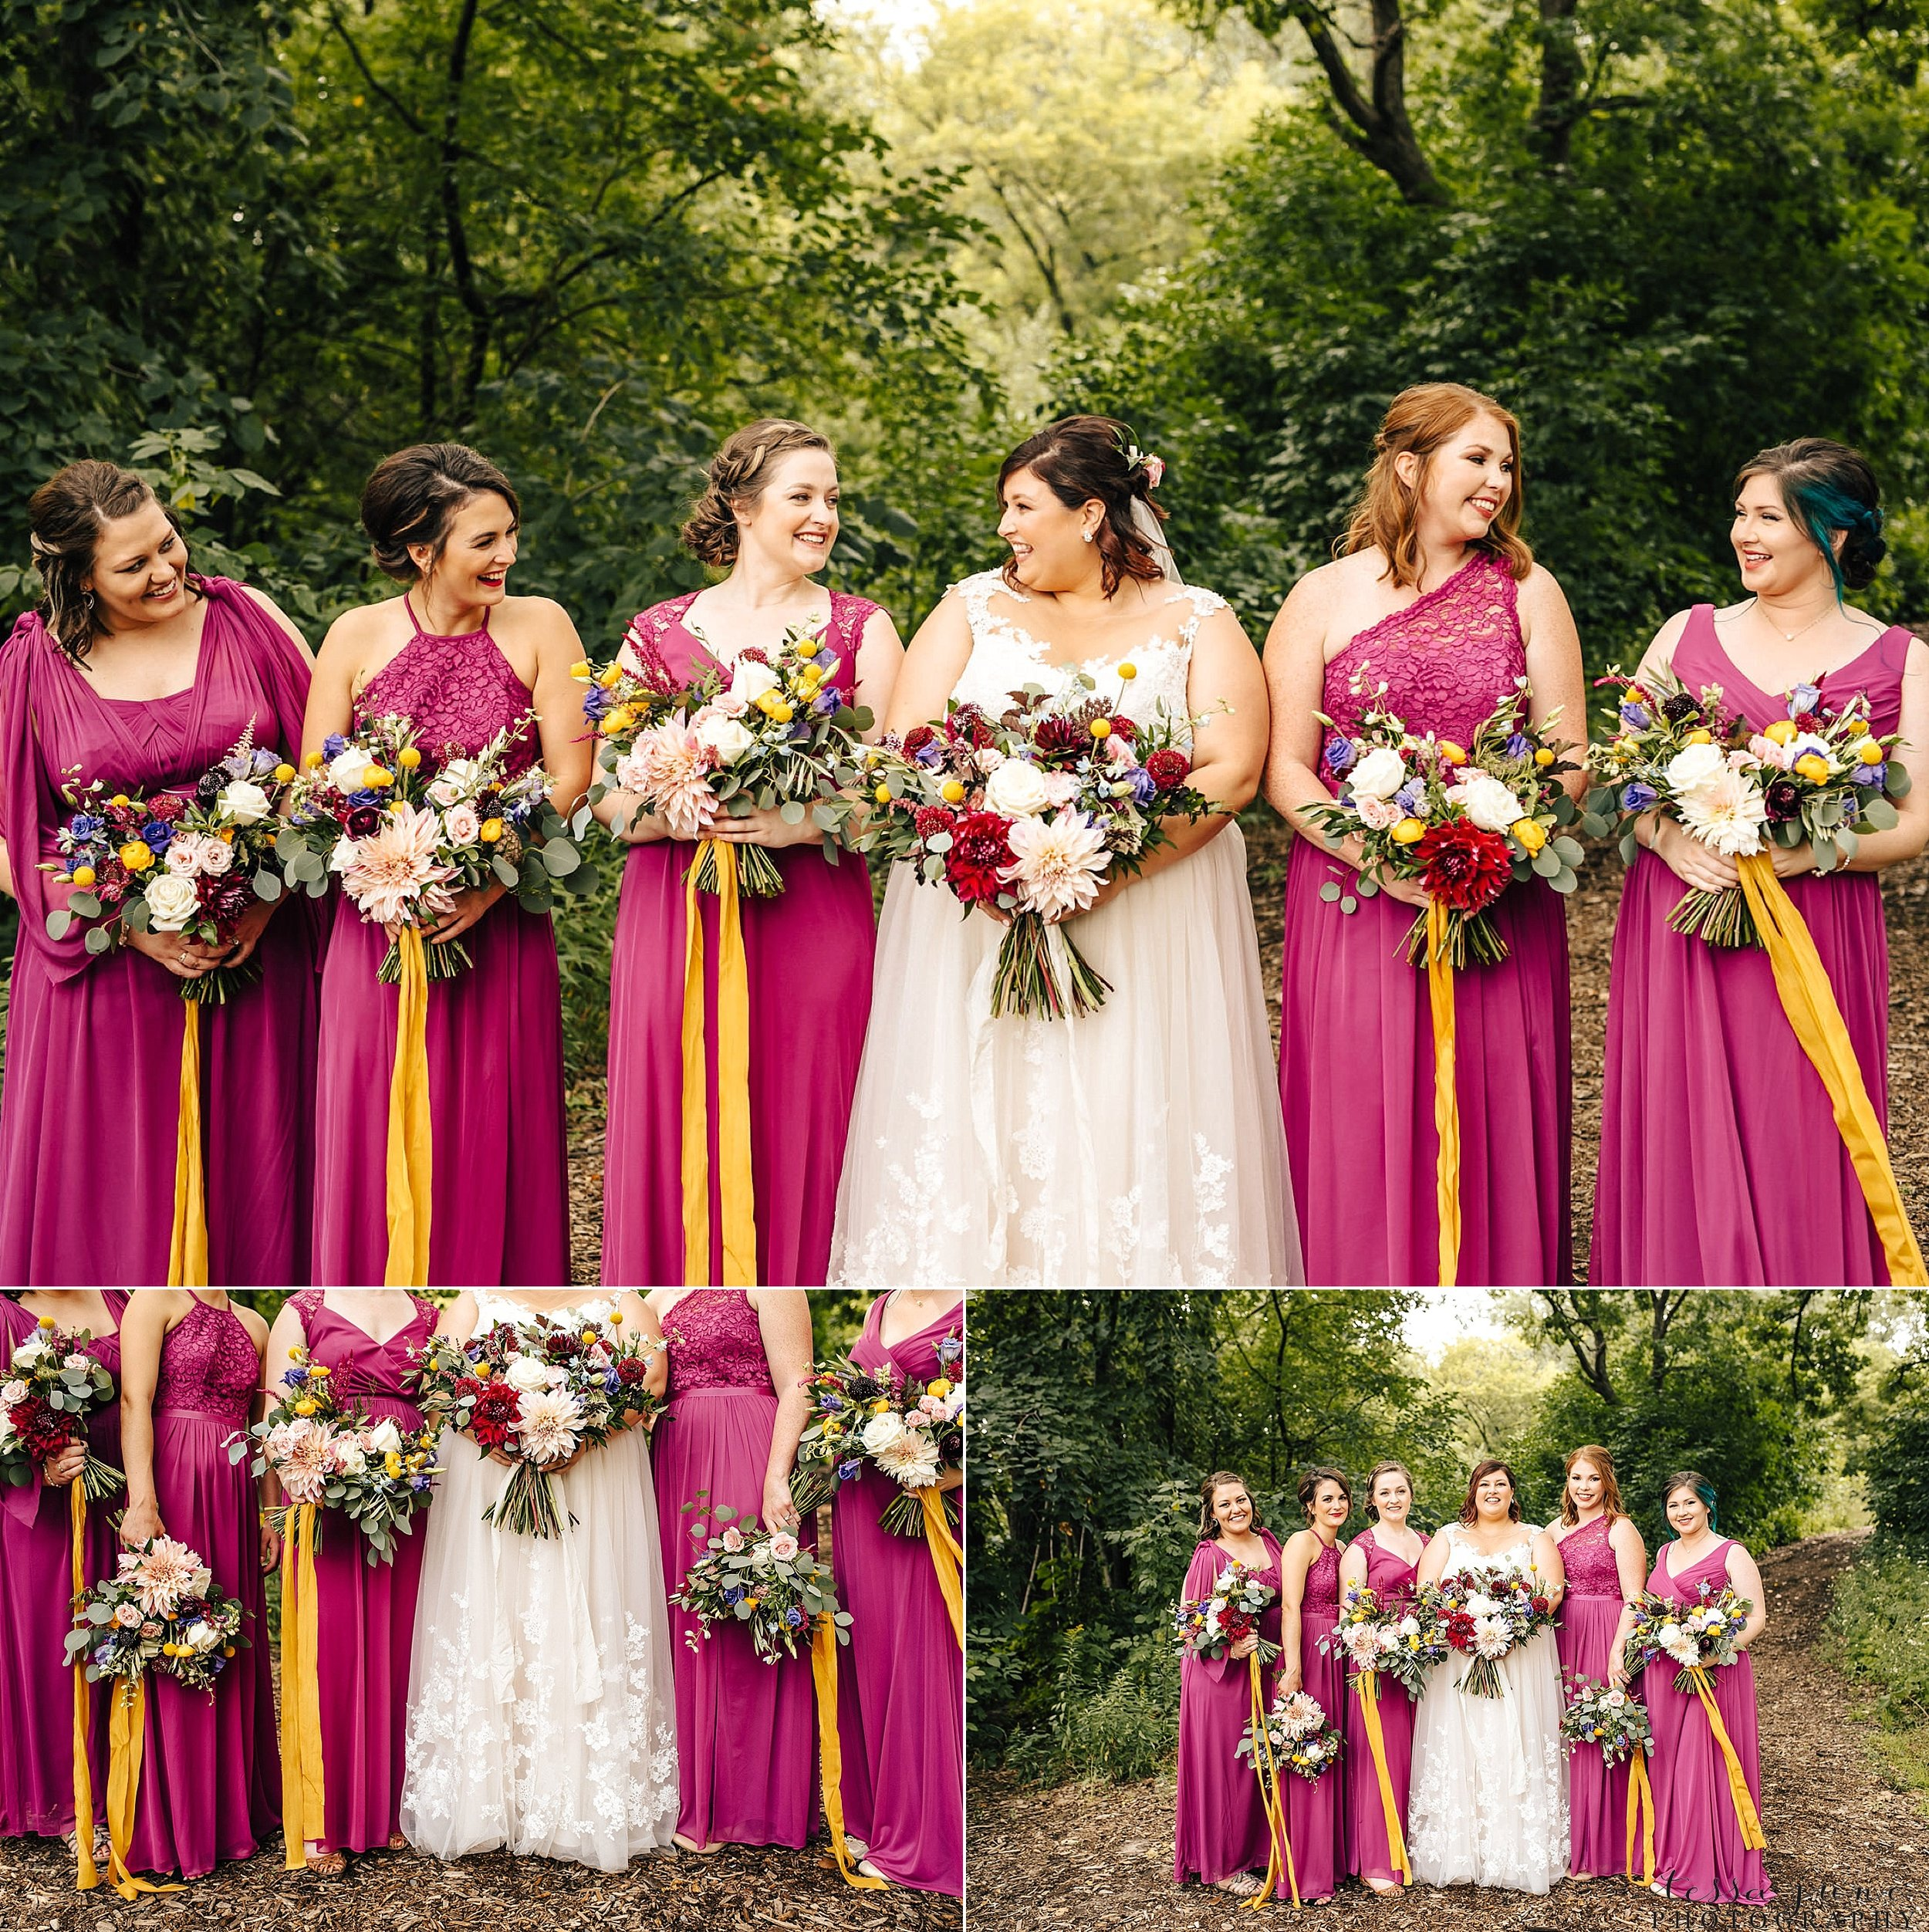 minneapolis-summer-wedding-at-silverwood-park-pristine-floral-79.jpg